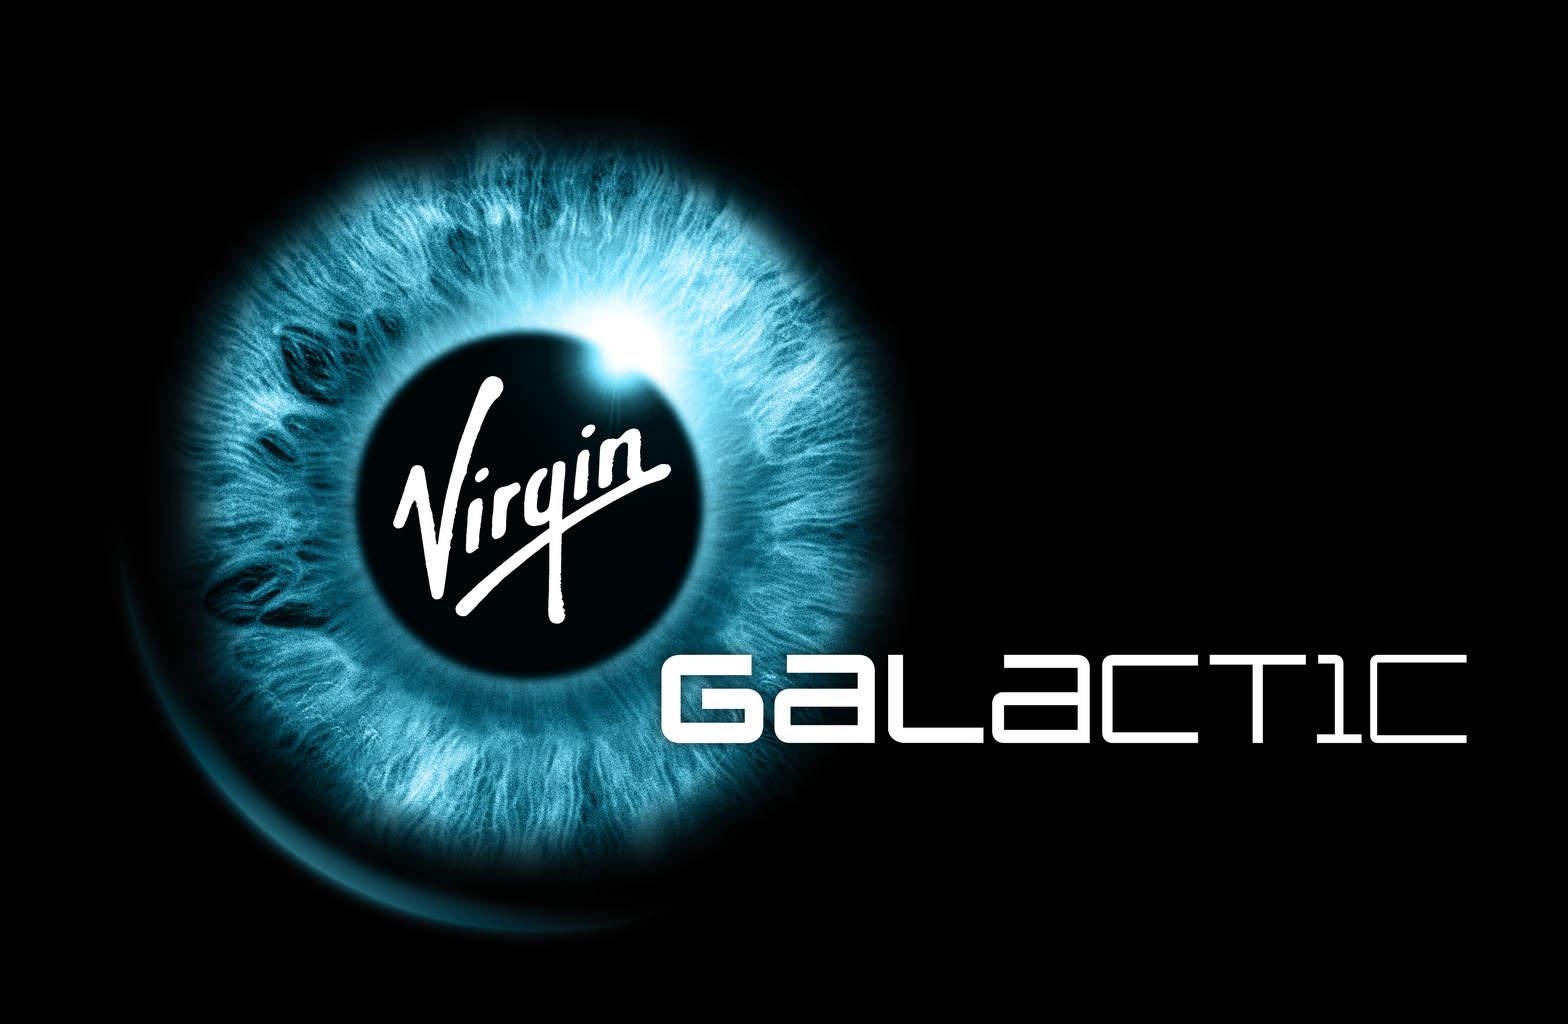 Virgin Galactic reveals new SpaceShipTwo